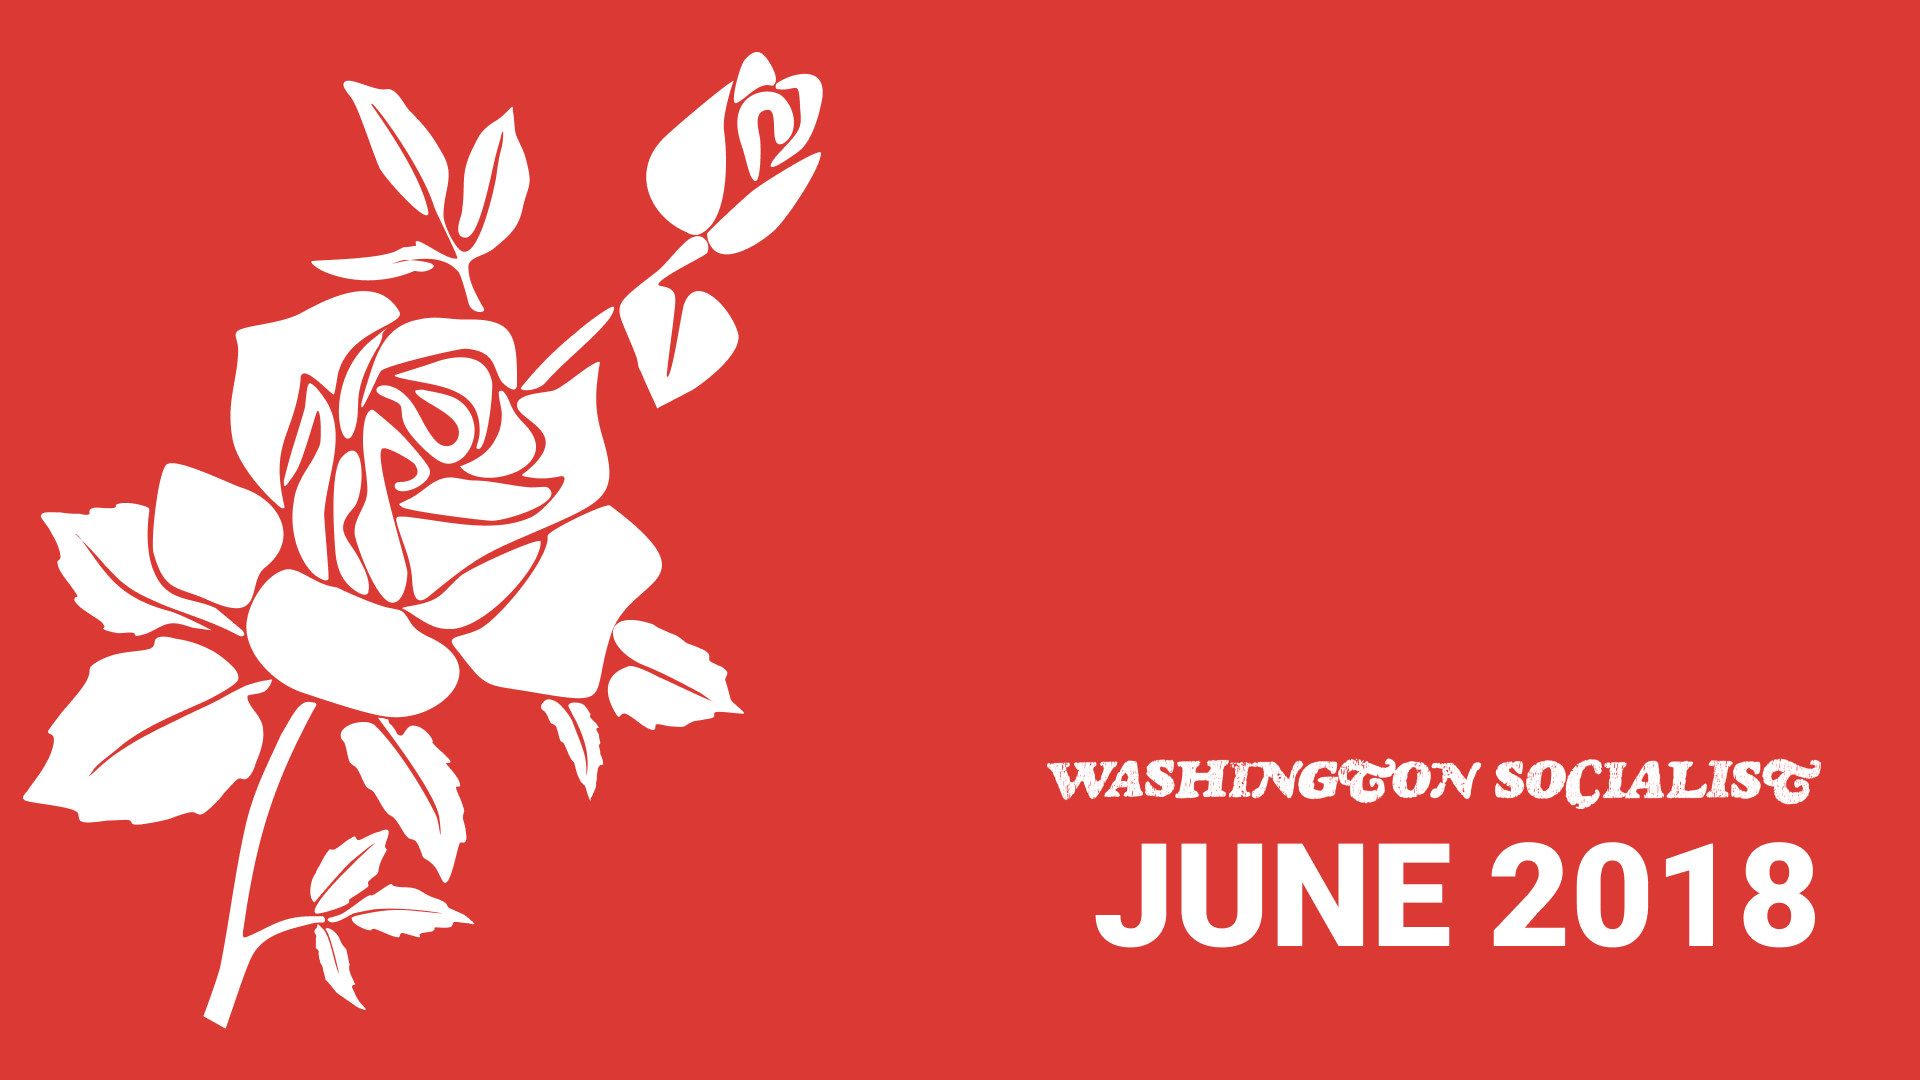 Washington Socialist Cover, June 2018